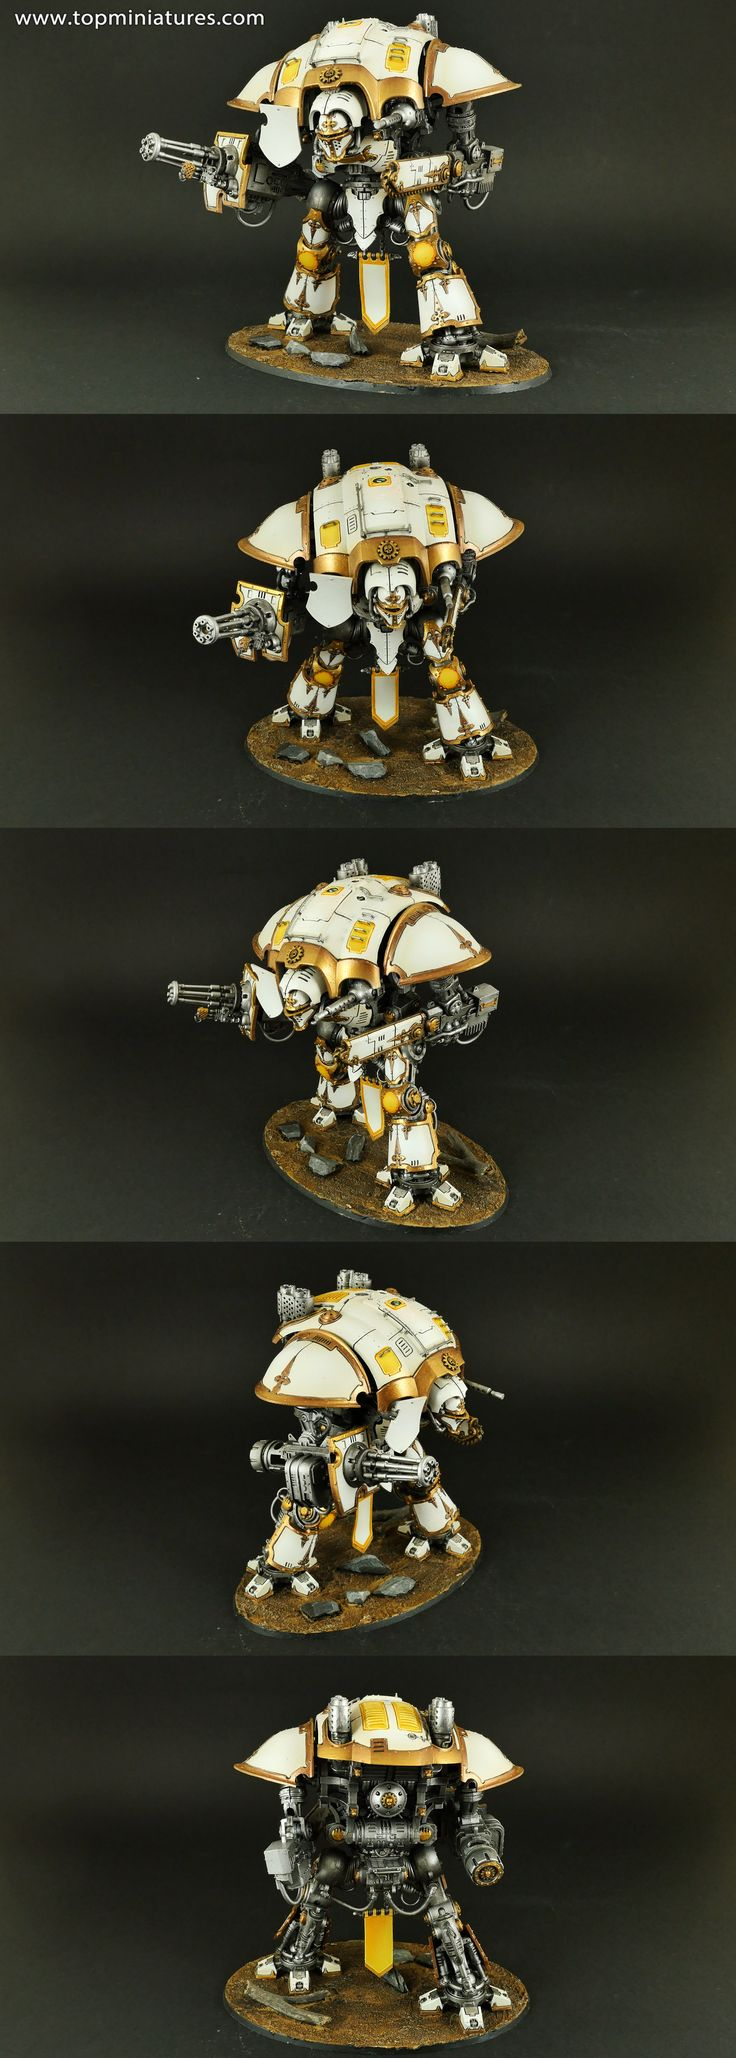 Warhammer 40k white imperial knight